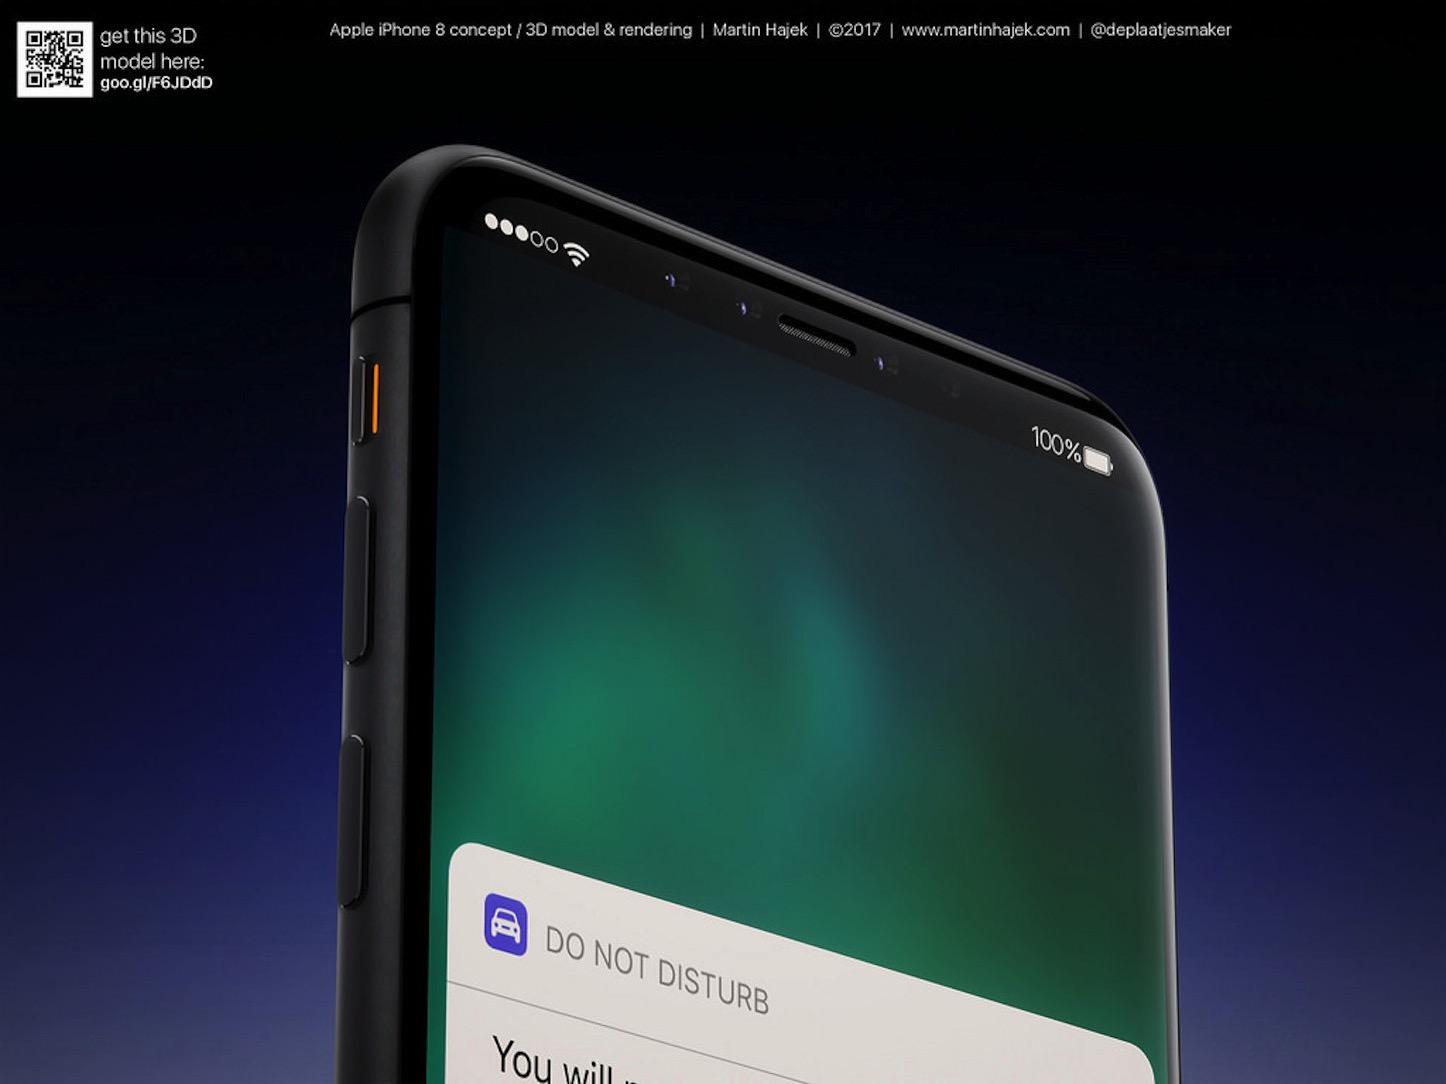 iPhone-Pro-8-Martin-Hajek-Reders-2.jpg